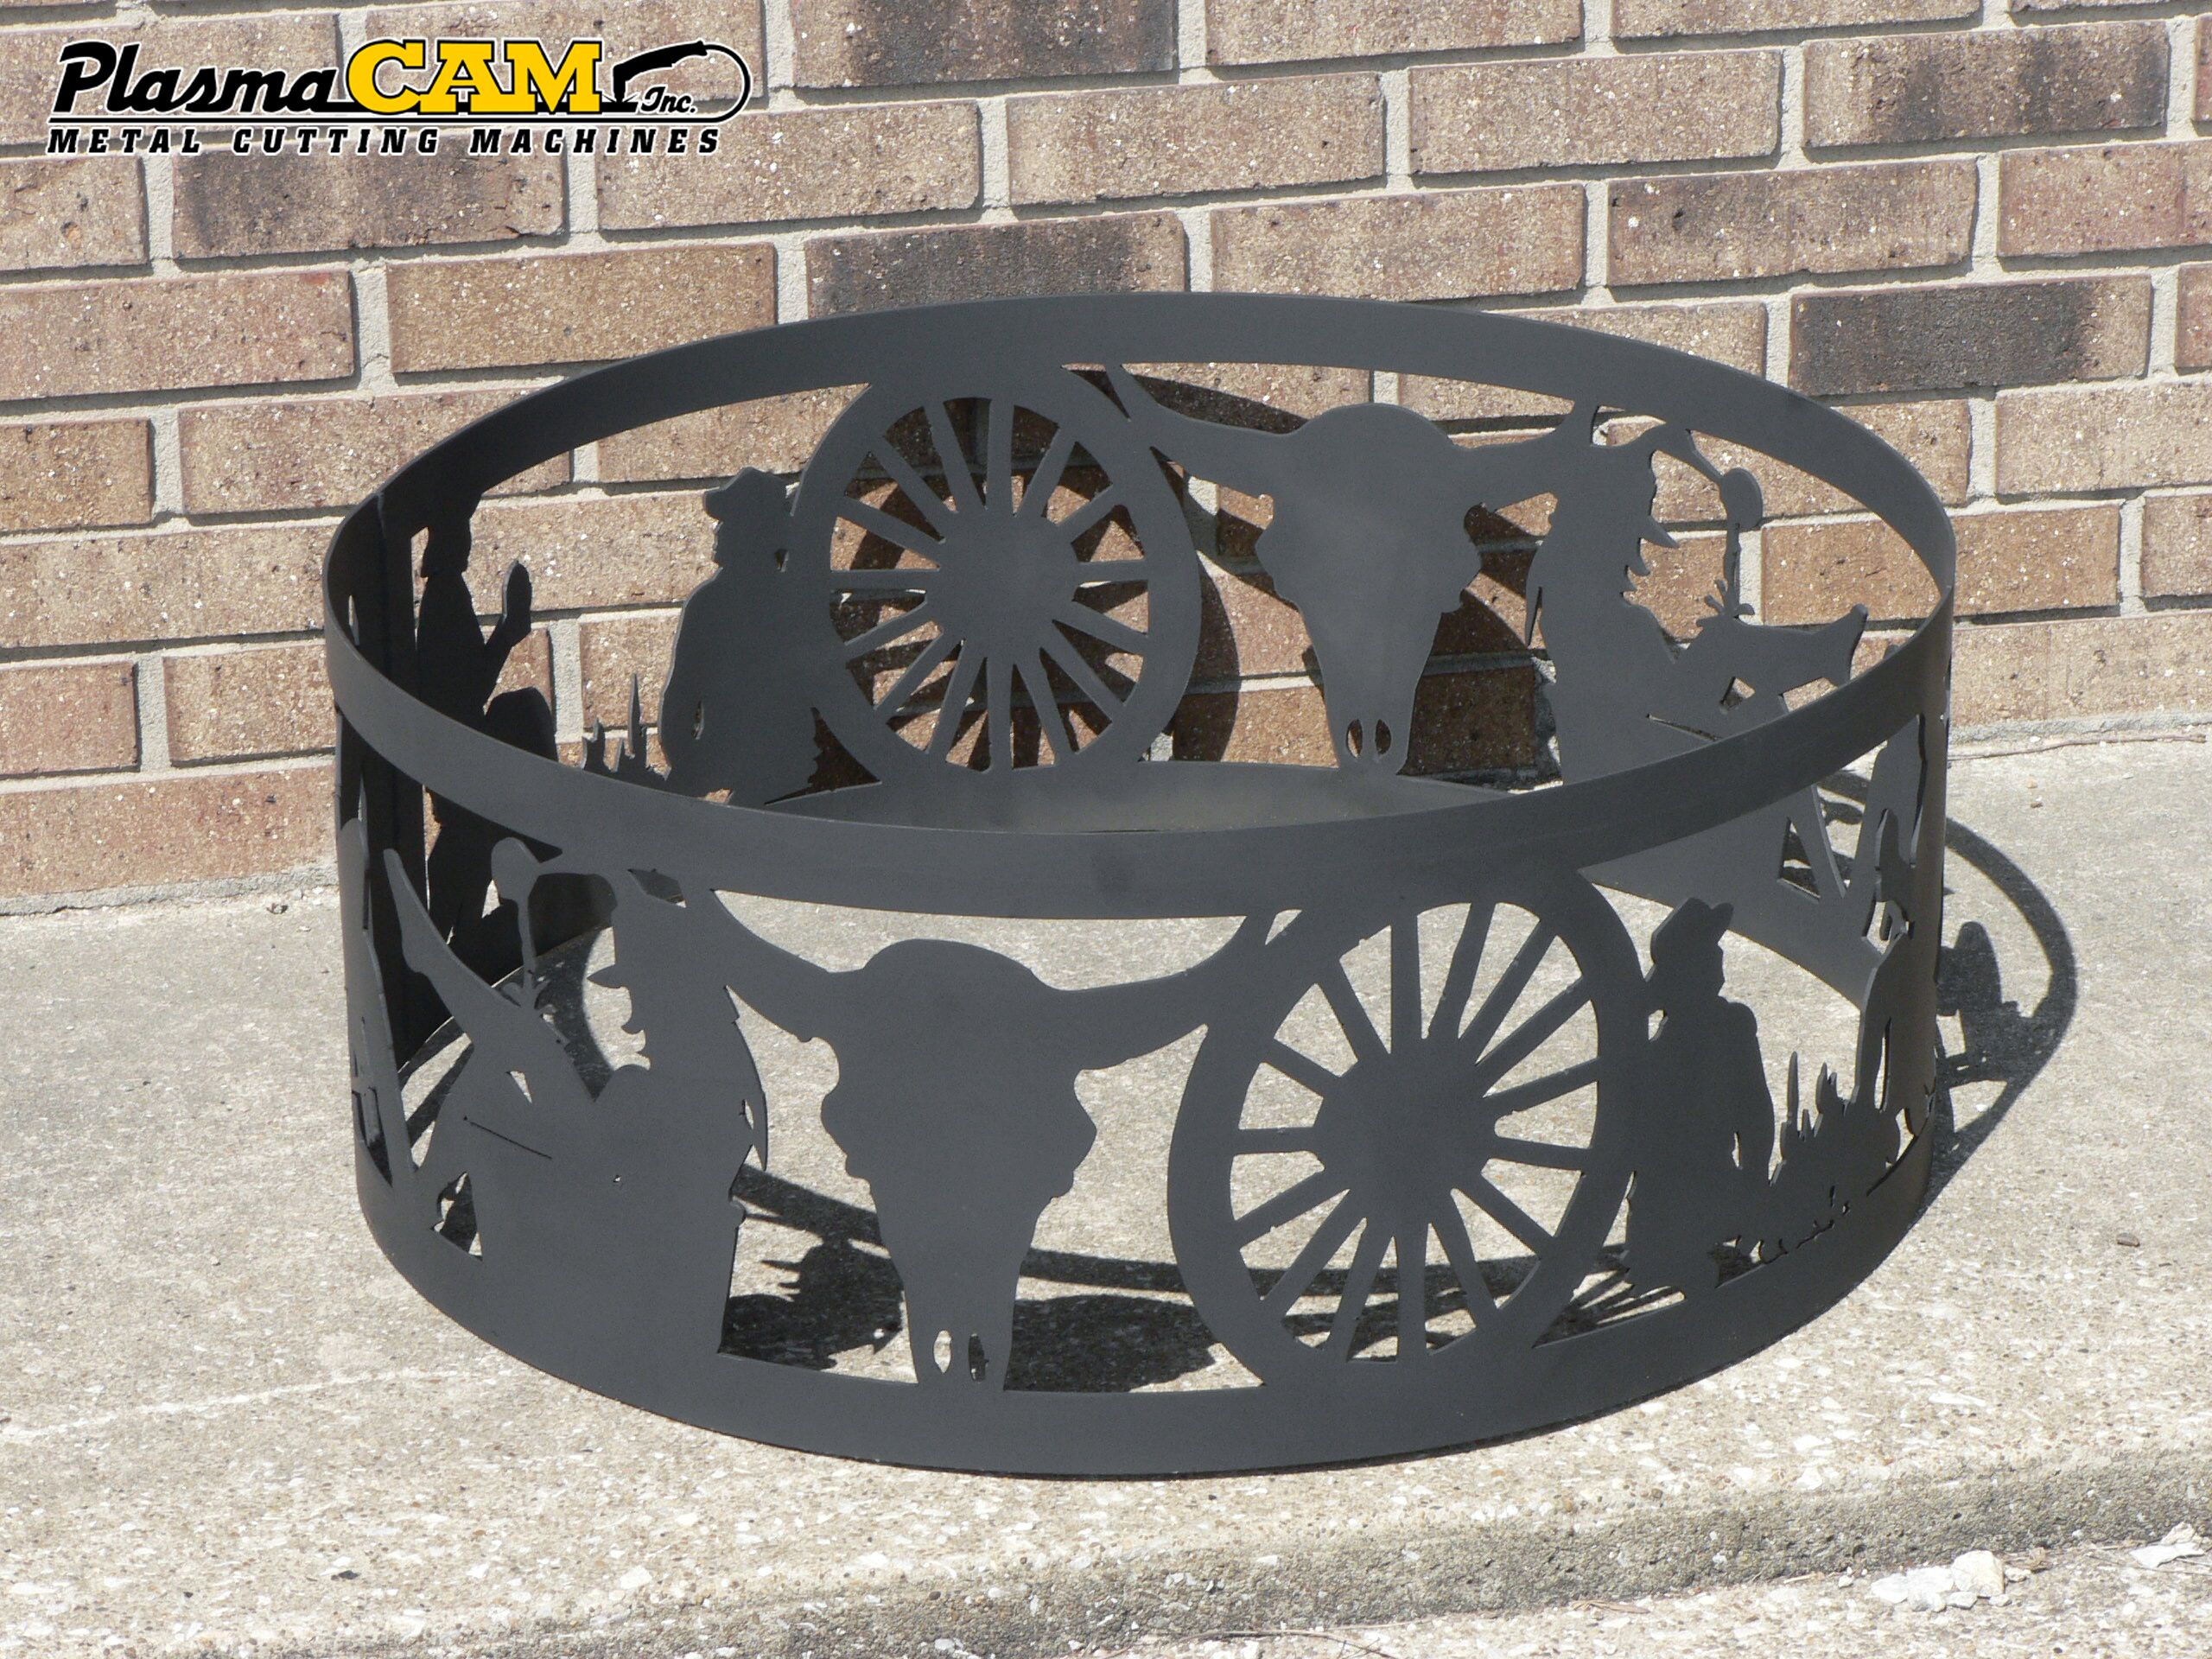 Western Design Wagon Wheel Cowboy Metal Fire Ring Design By